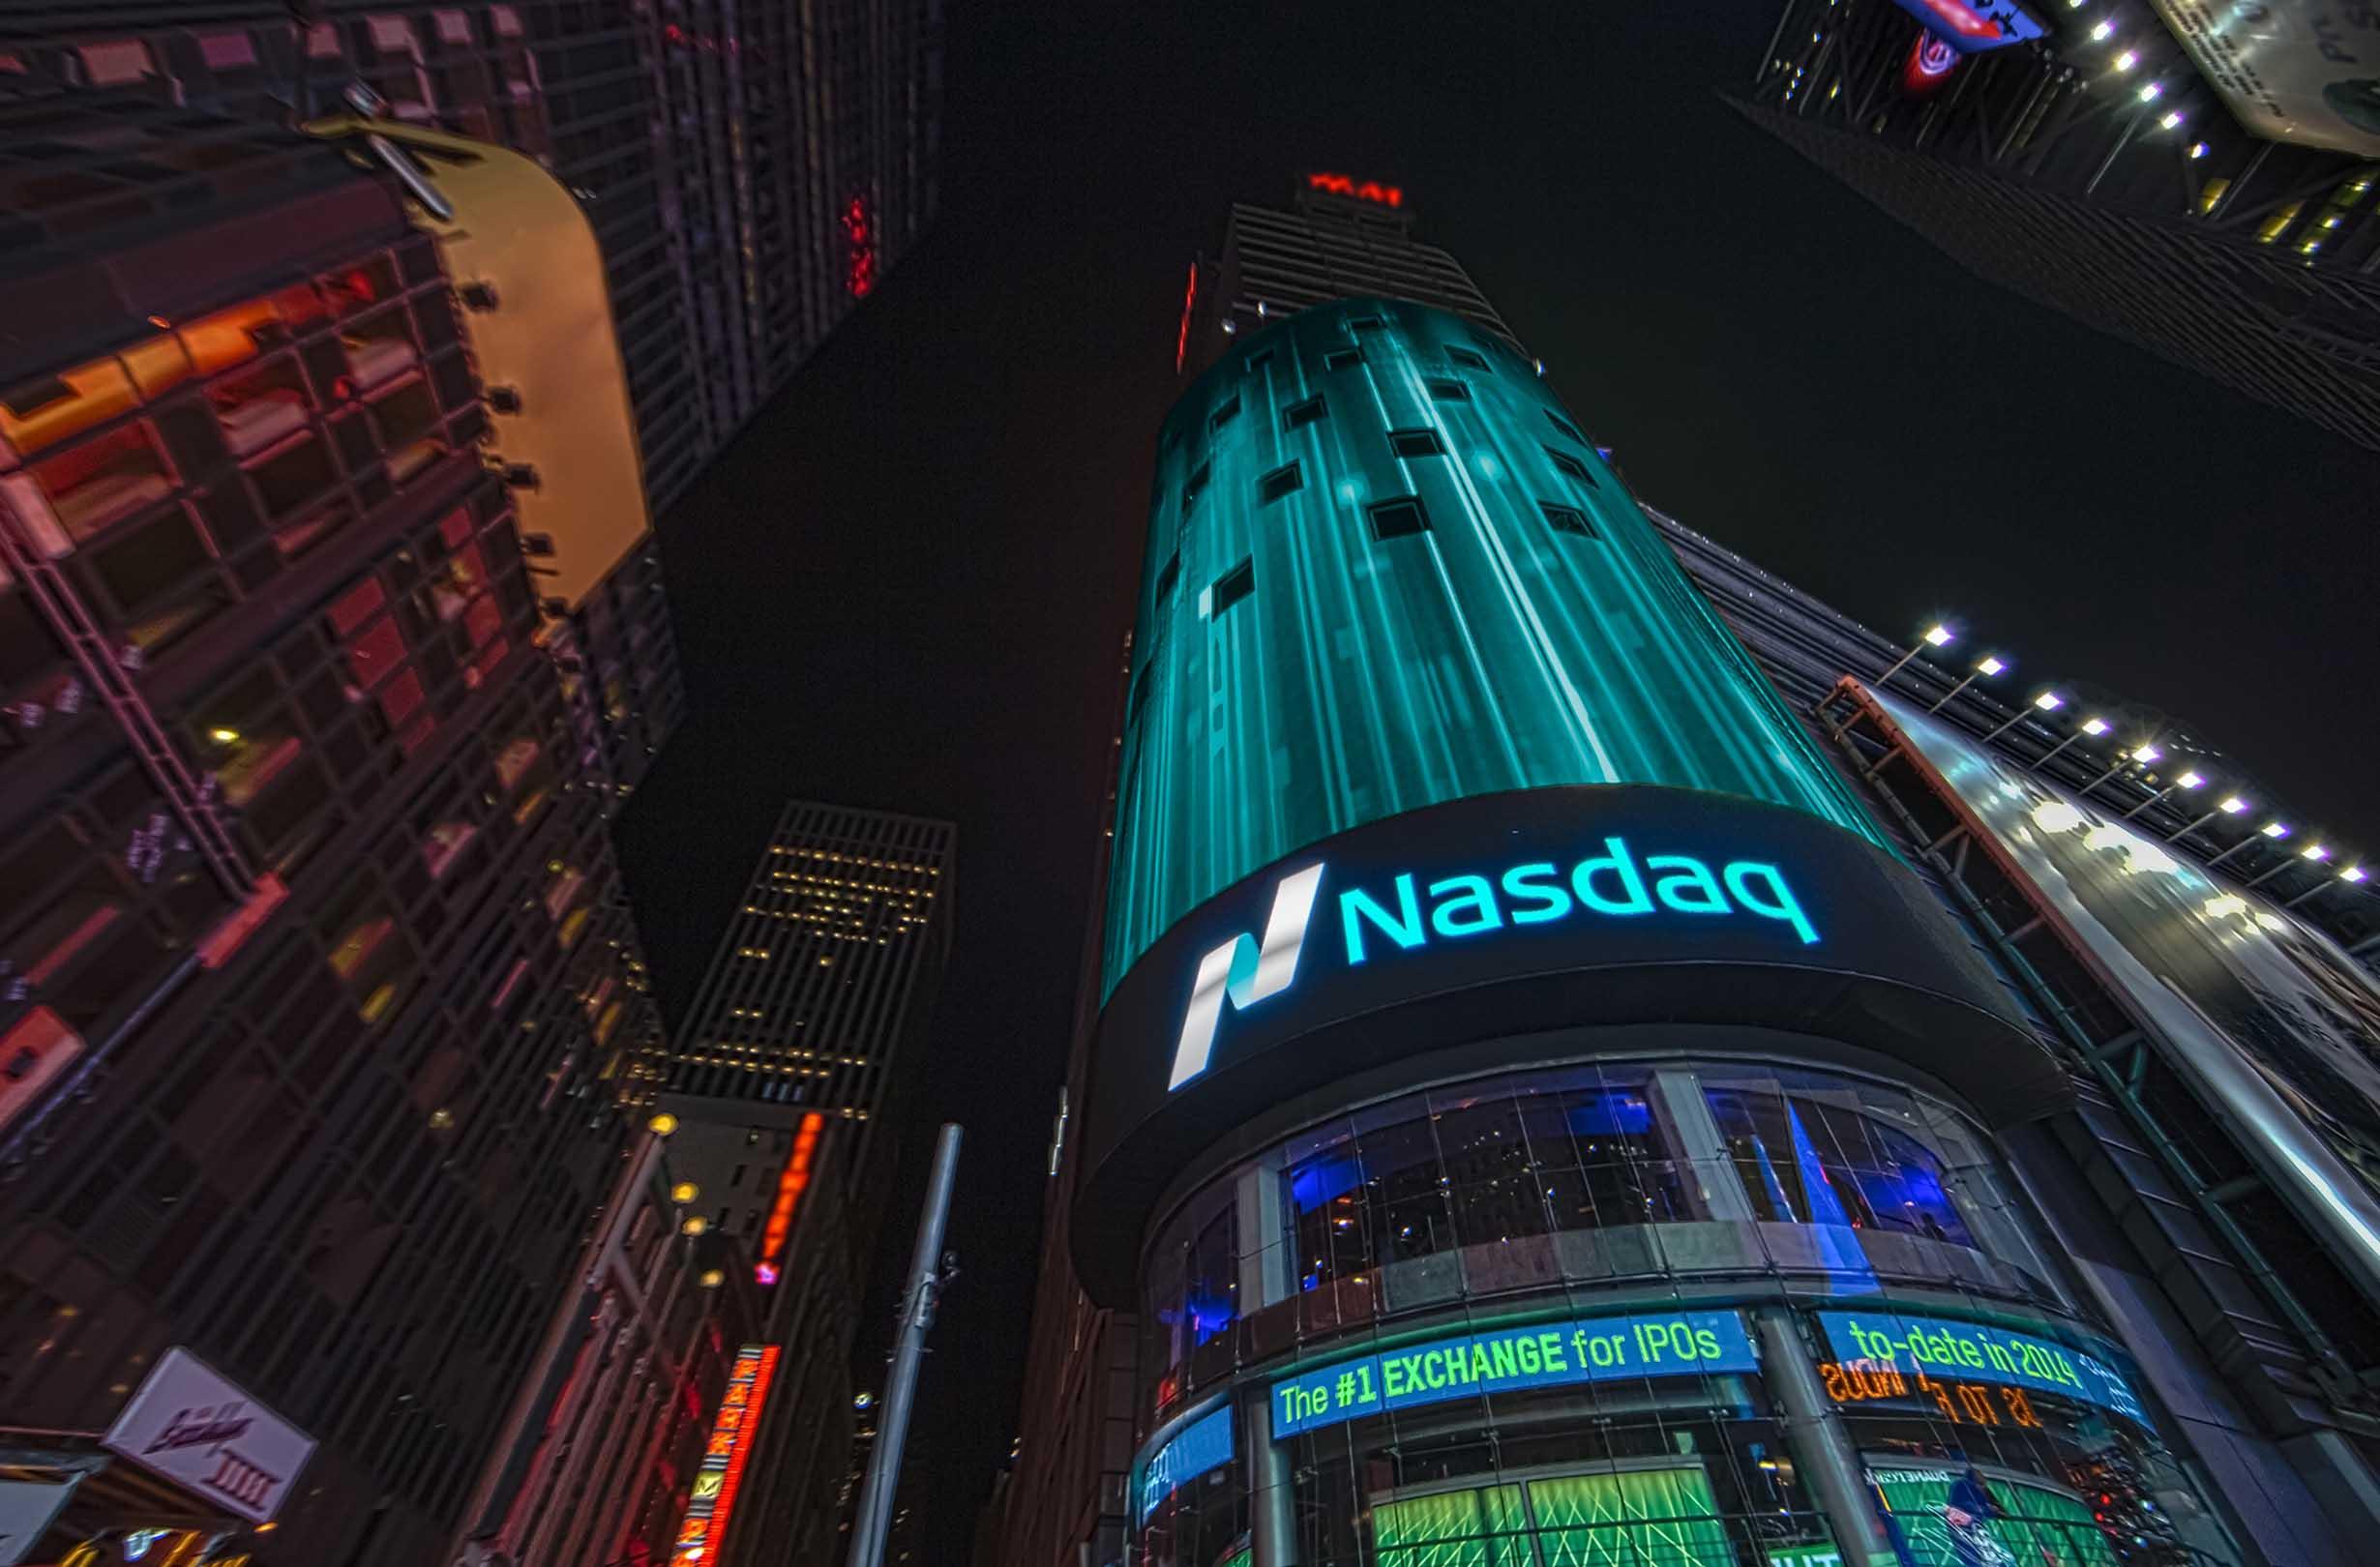 Nasdaq Backed Blockchain Project Raises $20 Million in Series B Funding 13